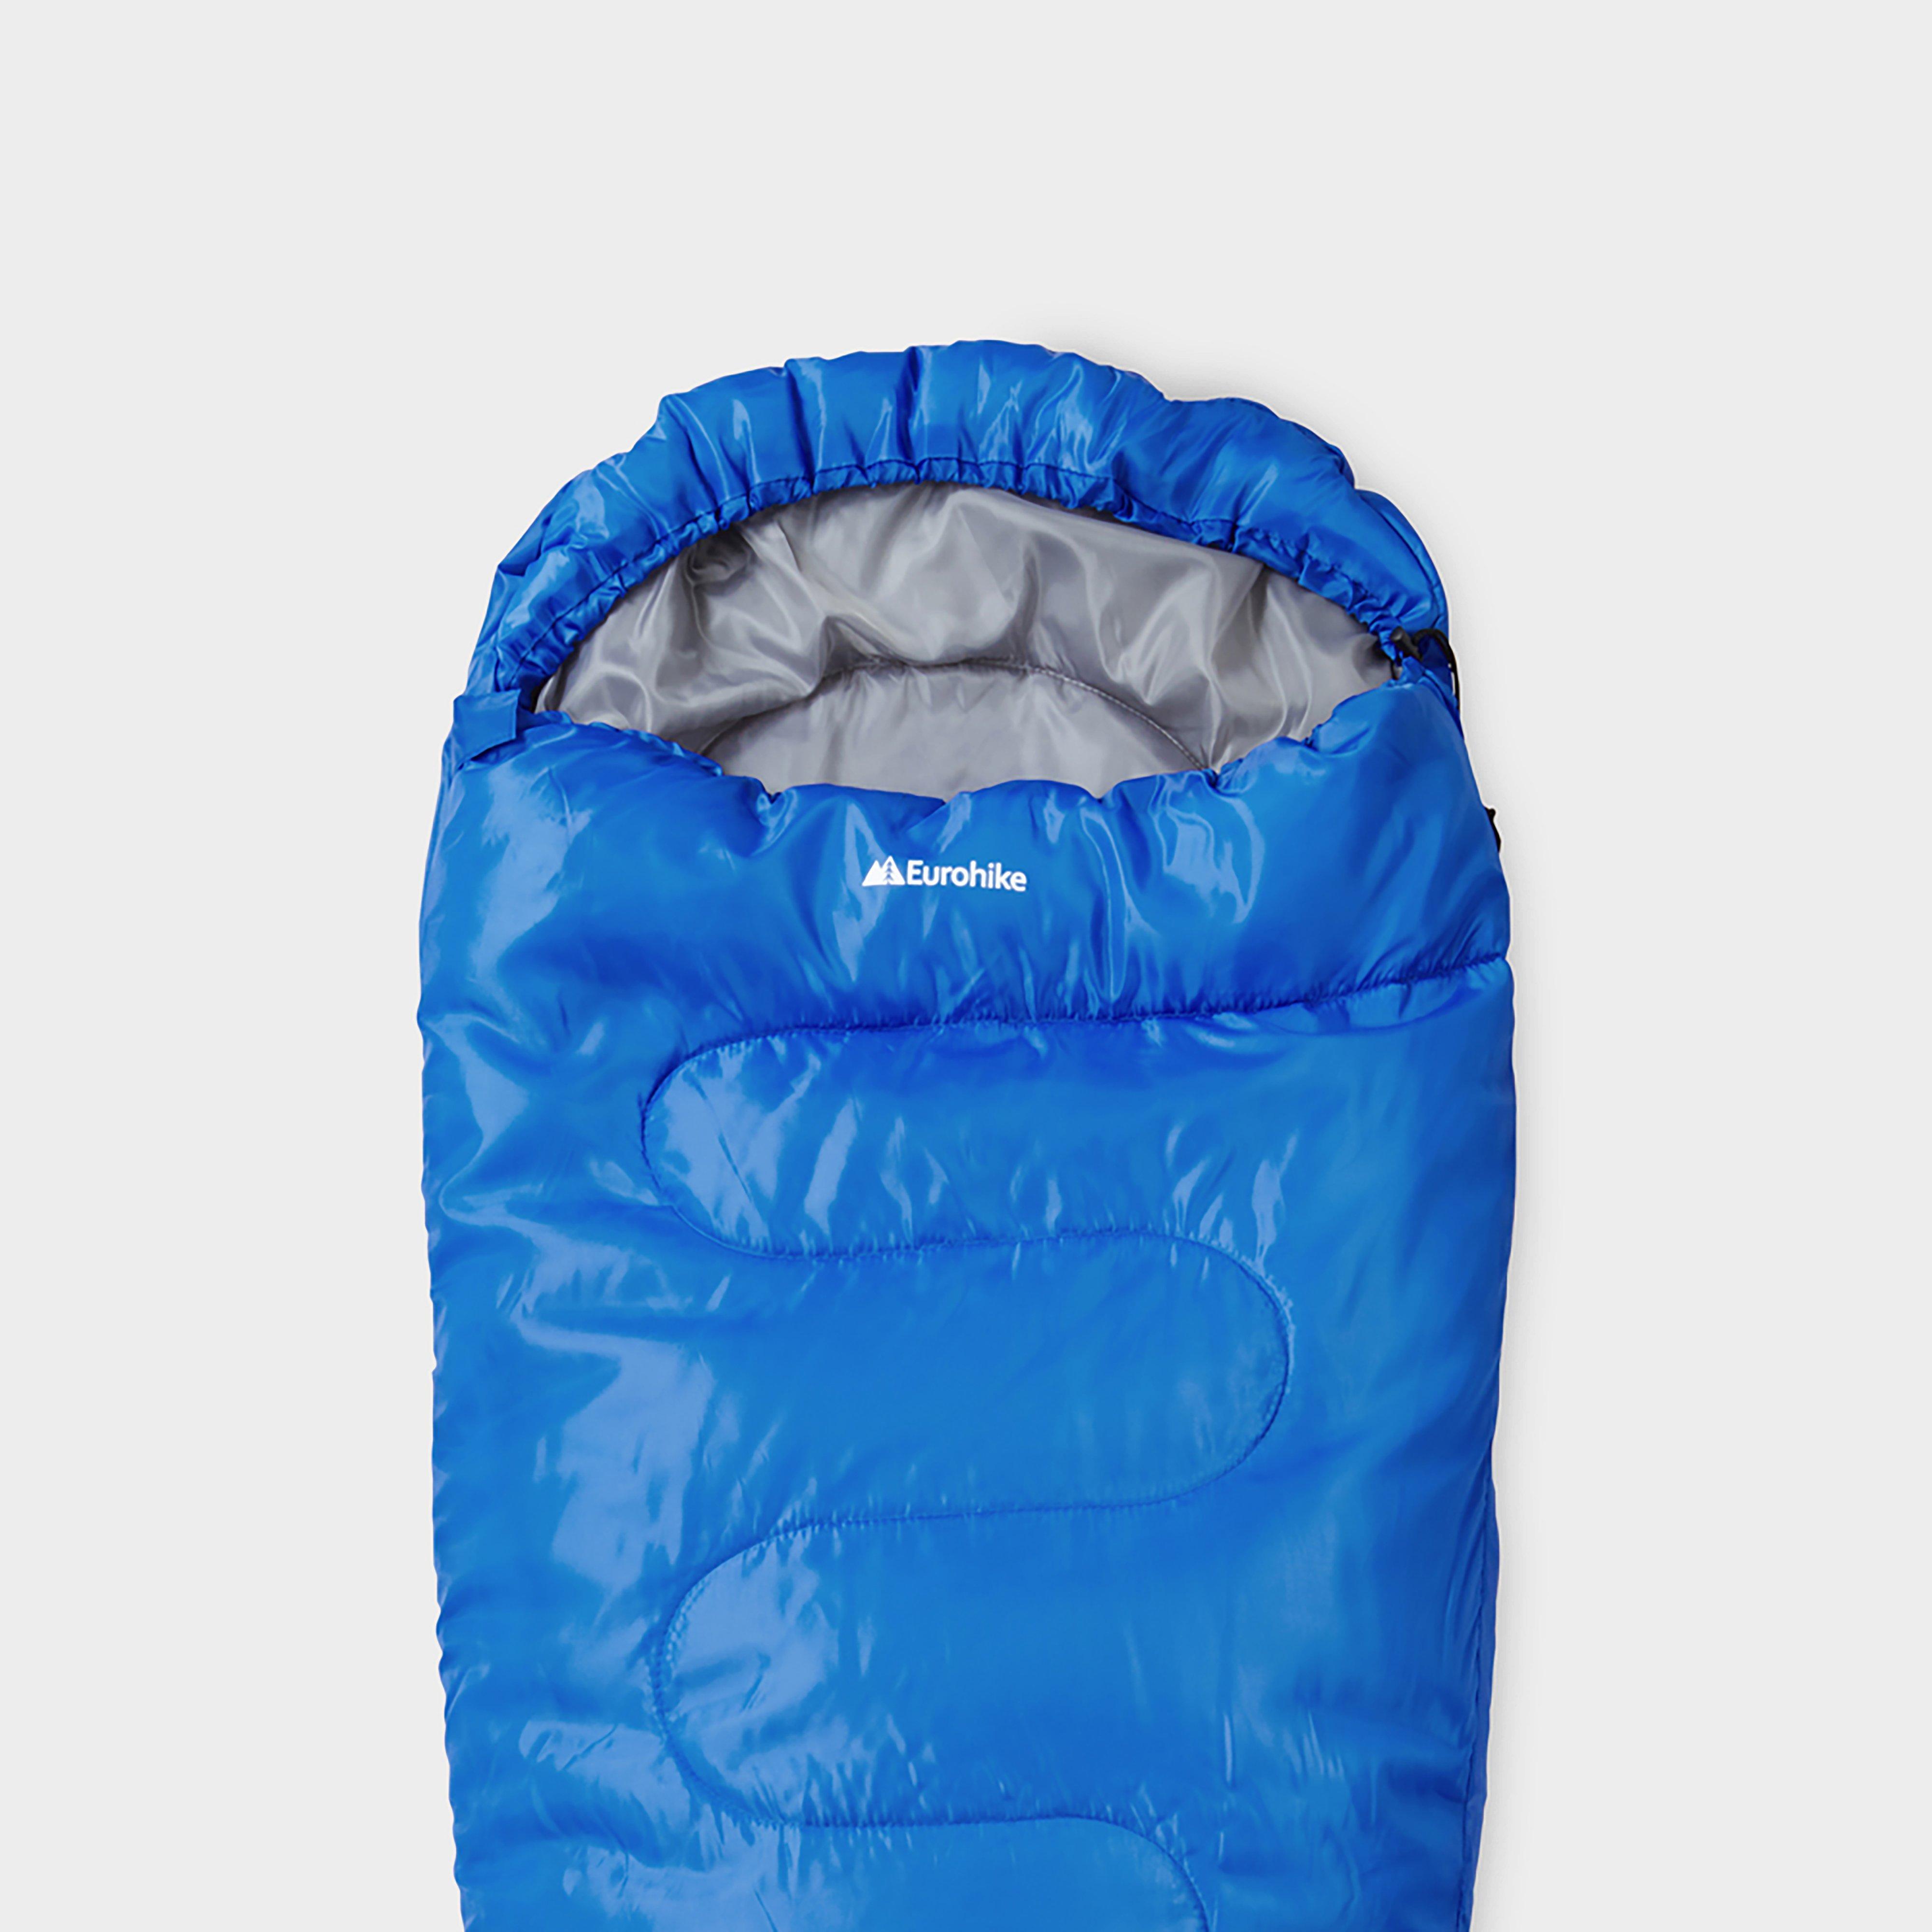 Eurohike Snooze Mummy Sleeping Bag - Blue/bbl  Blue/bbl